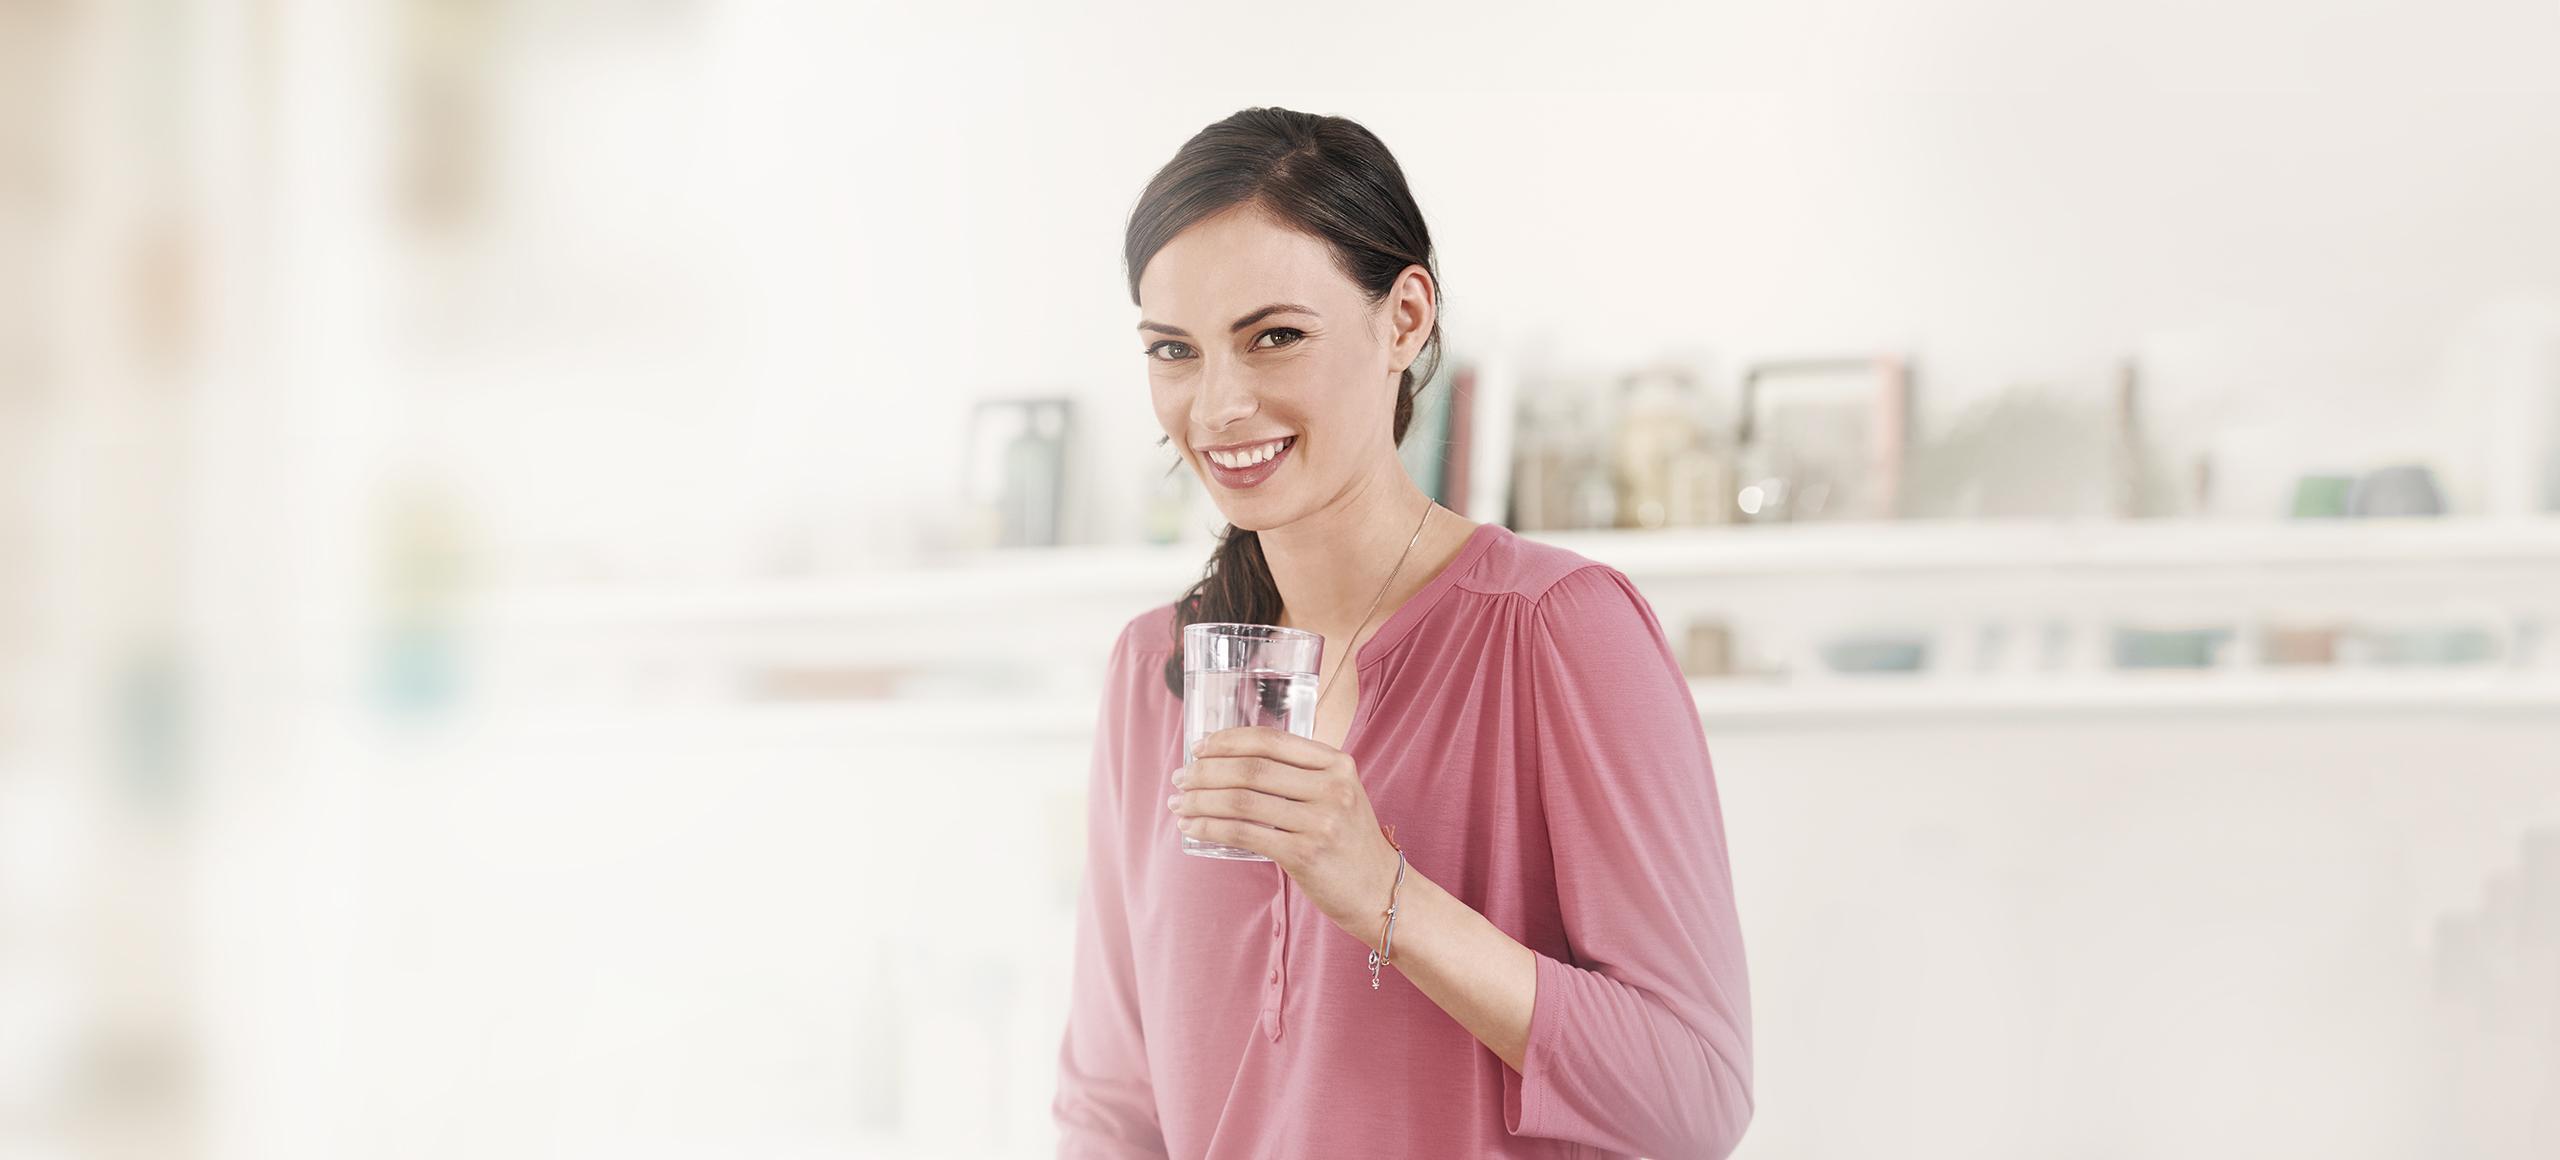 BRITA water filter MyBRITA services